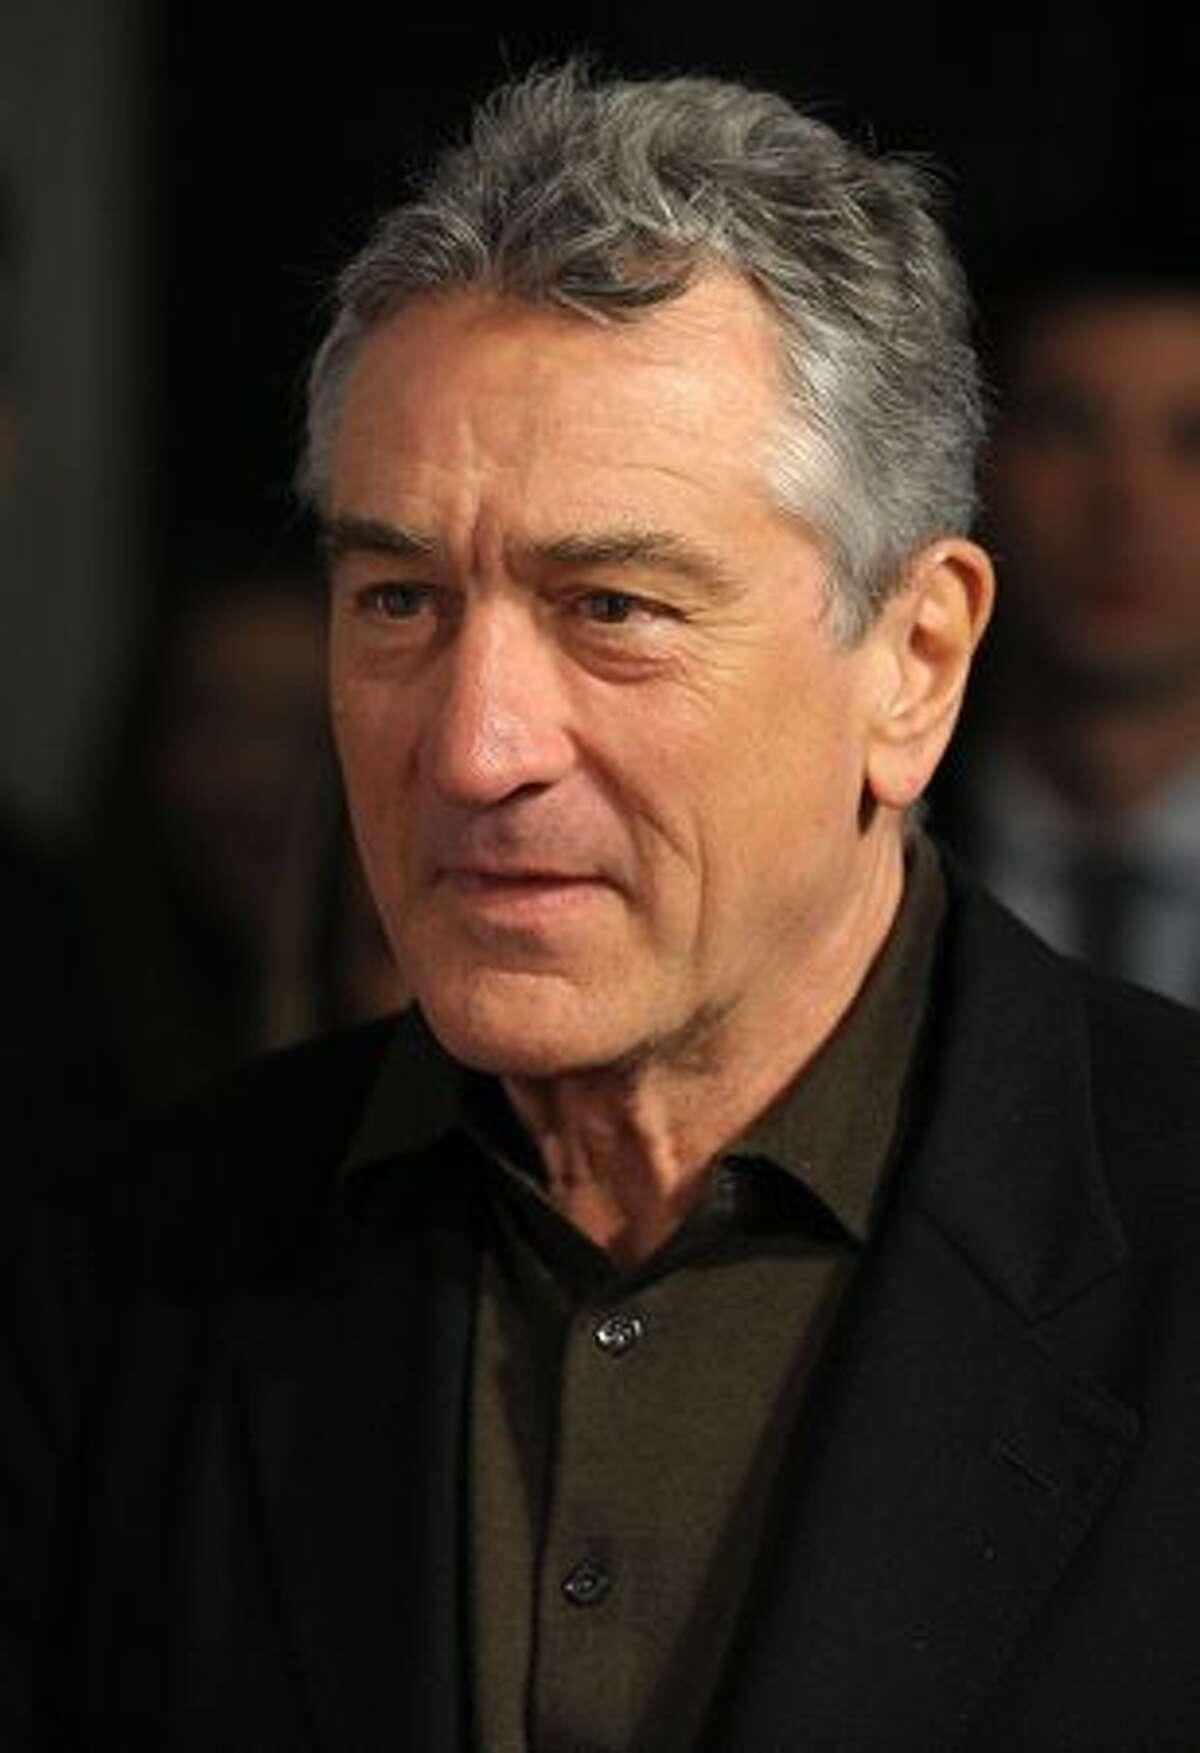 Robert DeNiro attends the Tribeca Film Institute's benefit screening of